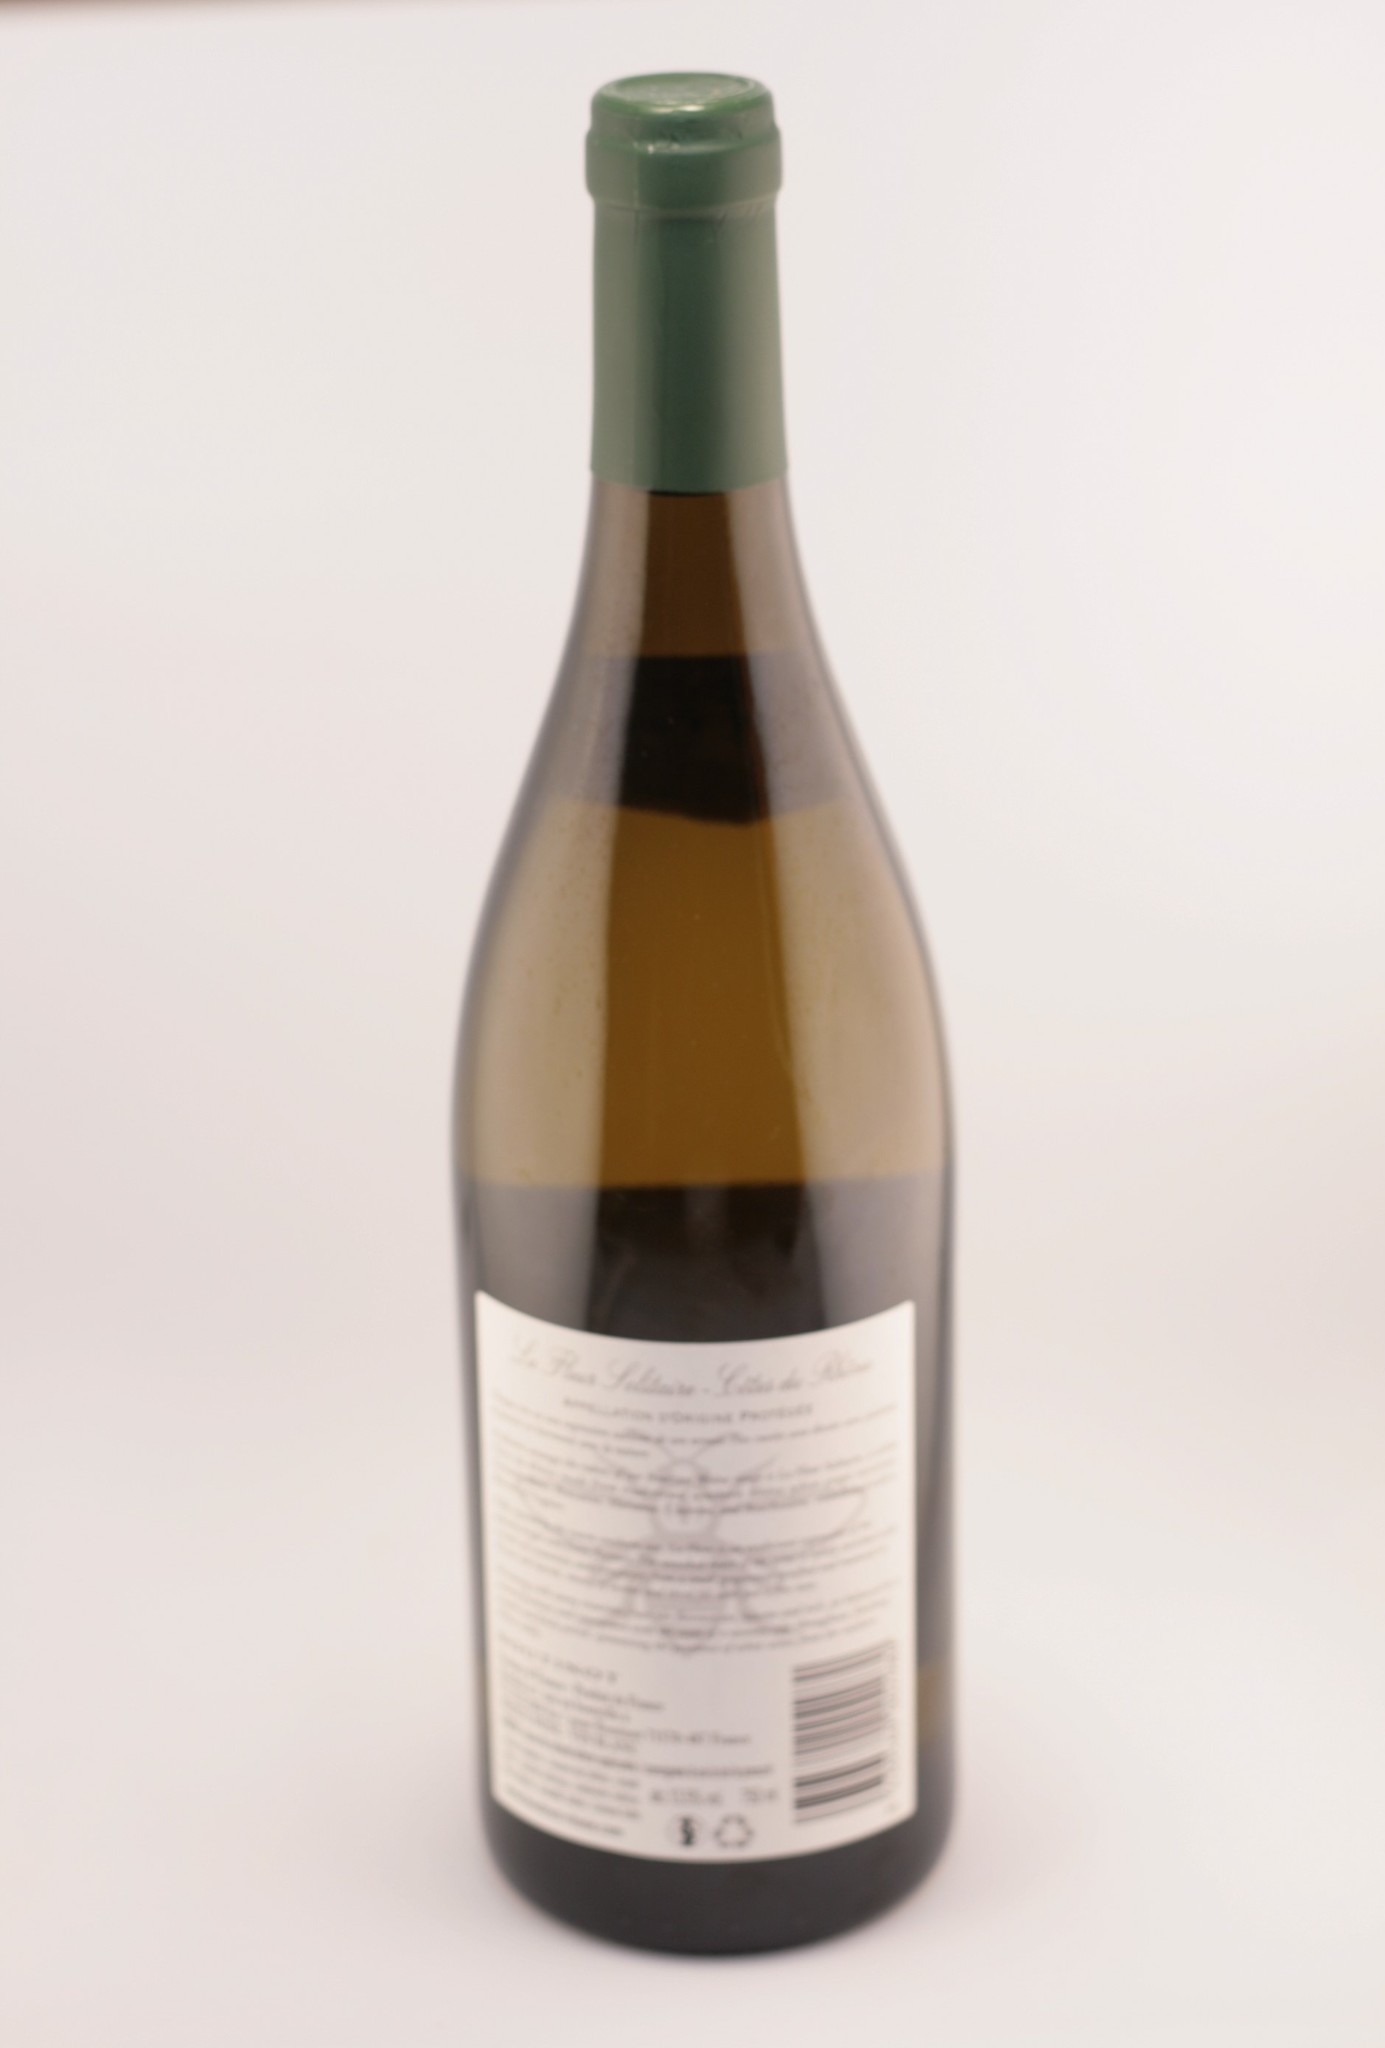 La Fleur Solitaire | Boutenot Winery | Rhône |2018